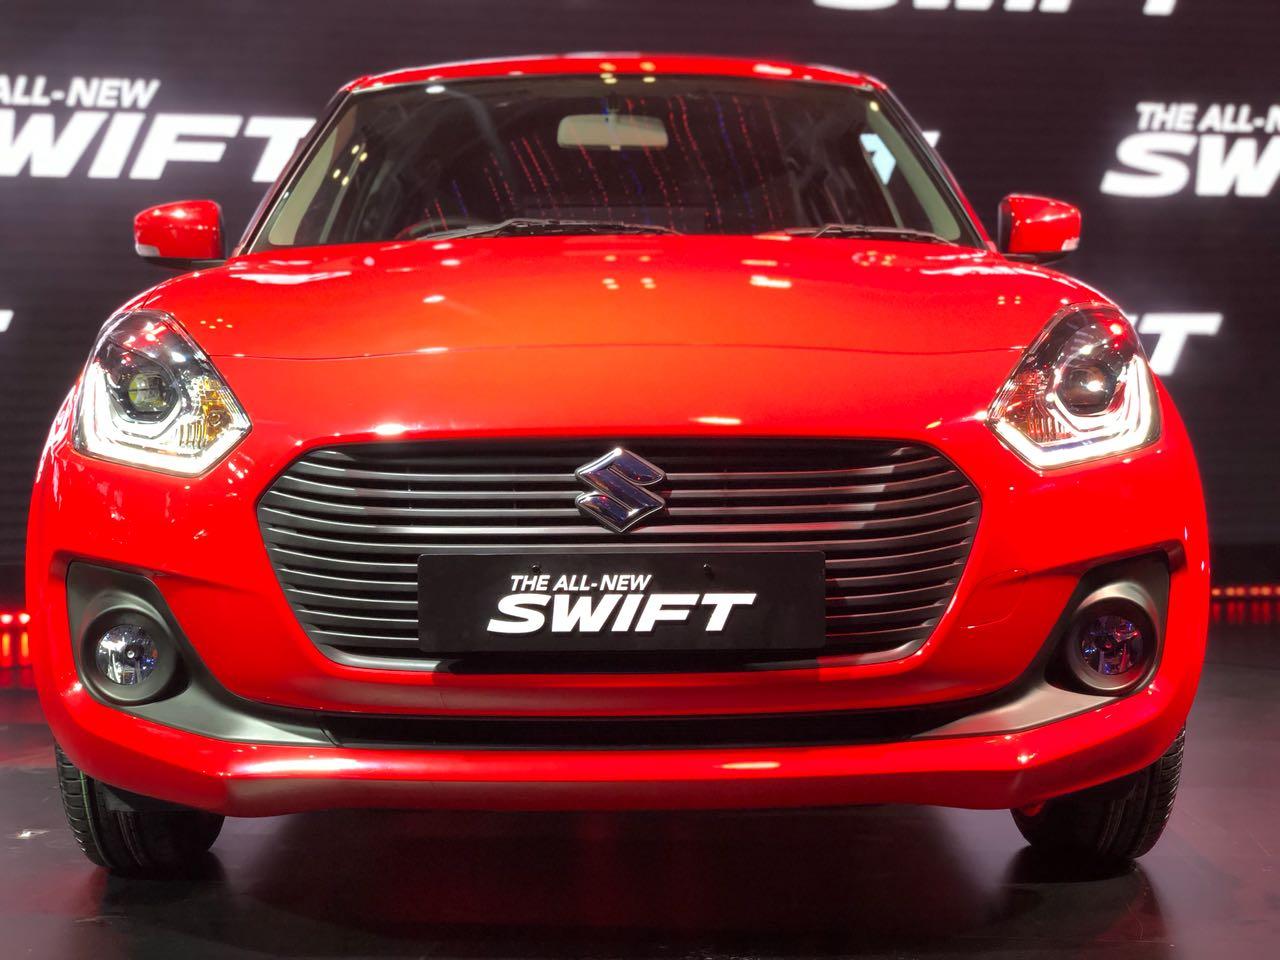 2018 Maruti Suzuki Swift Price List Features Accessories Specs 2000 Transmission Sd Sensor